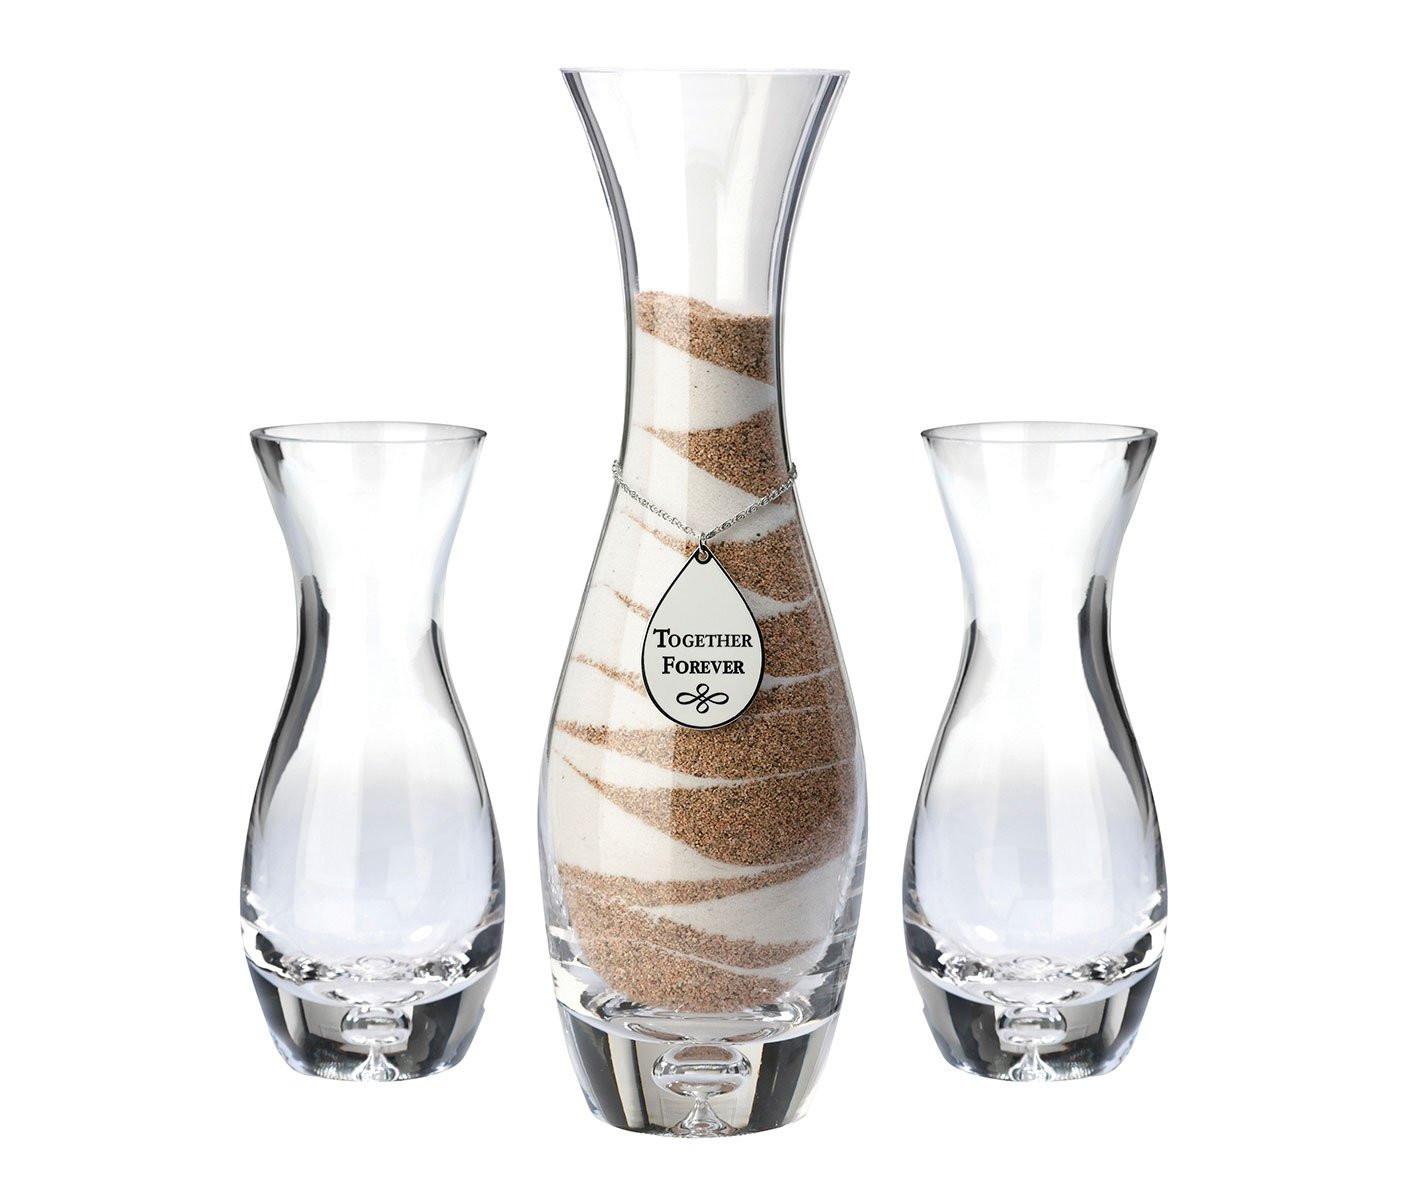 wedding sand vase sets of sand ceremony vase amazon com inside lillian rose wedding ceremony unity sand vases together forever